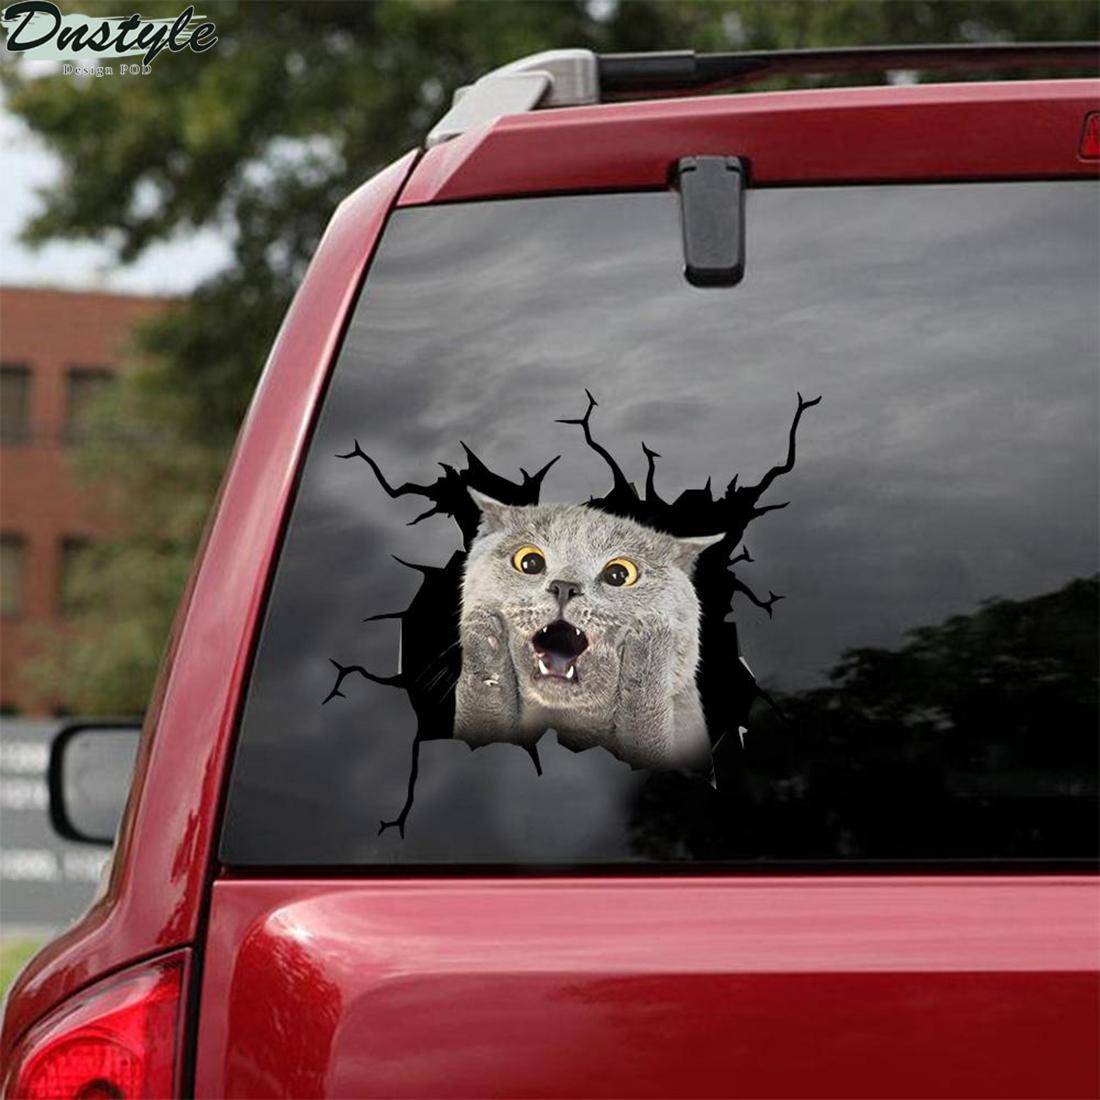 British shorthair screaming crack car decal sticker 1